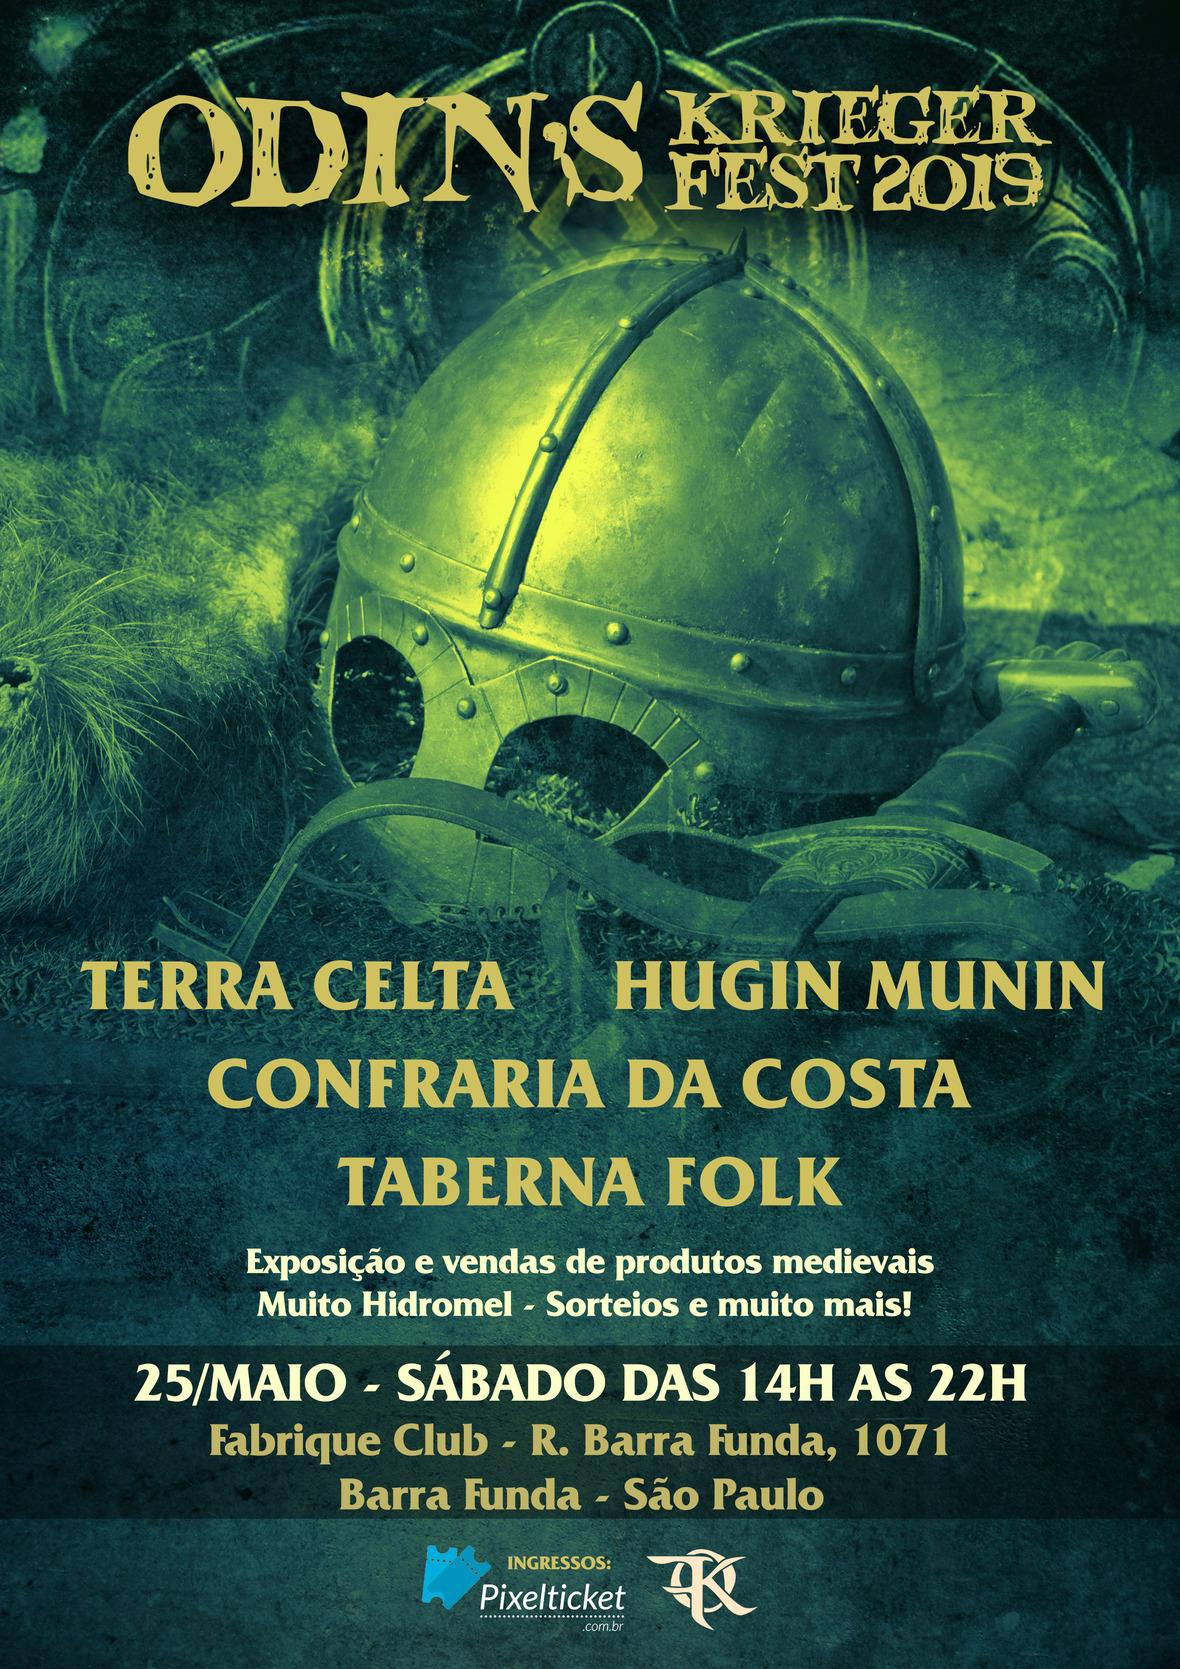 Odins Krieger Fest - A4 Geral 02